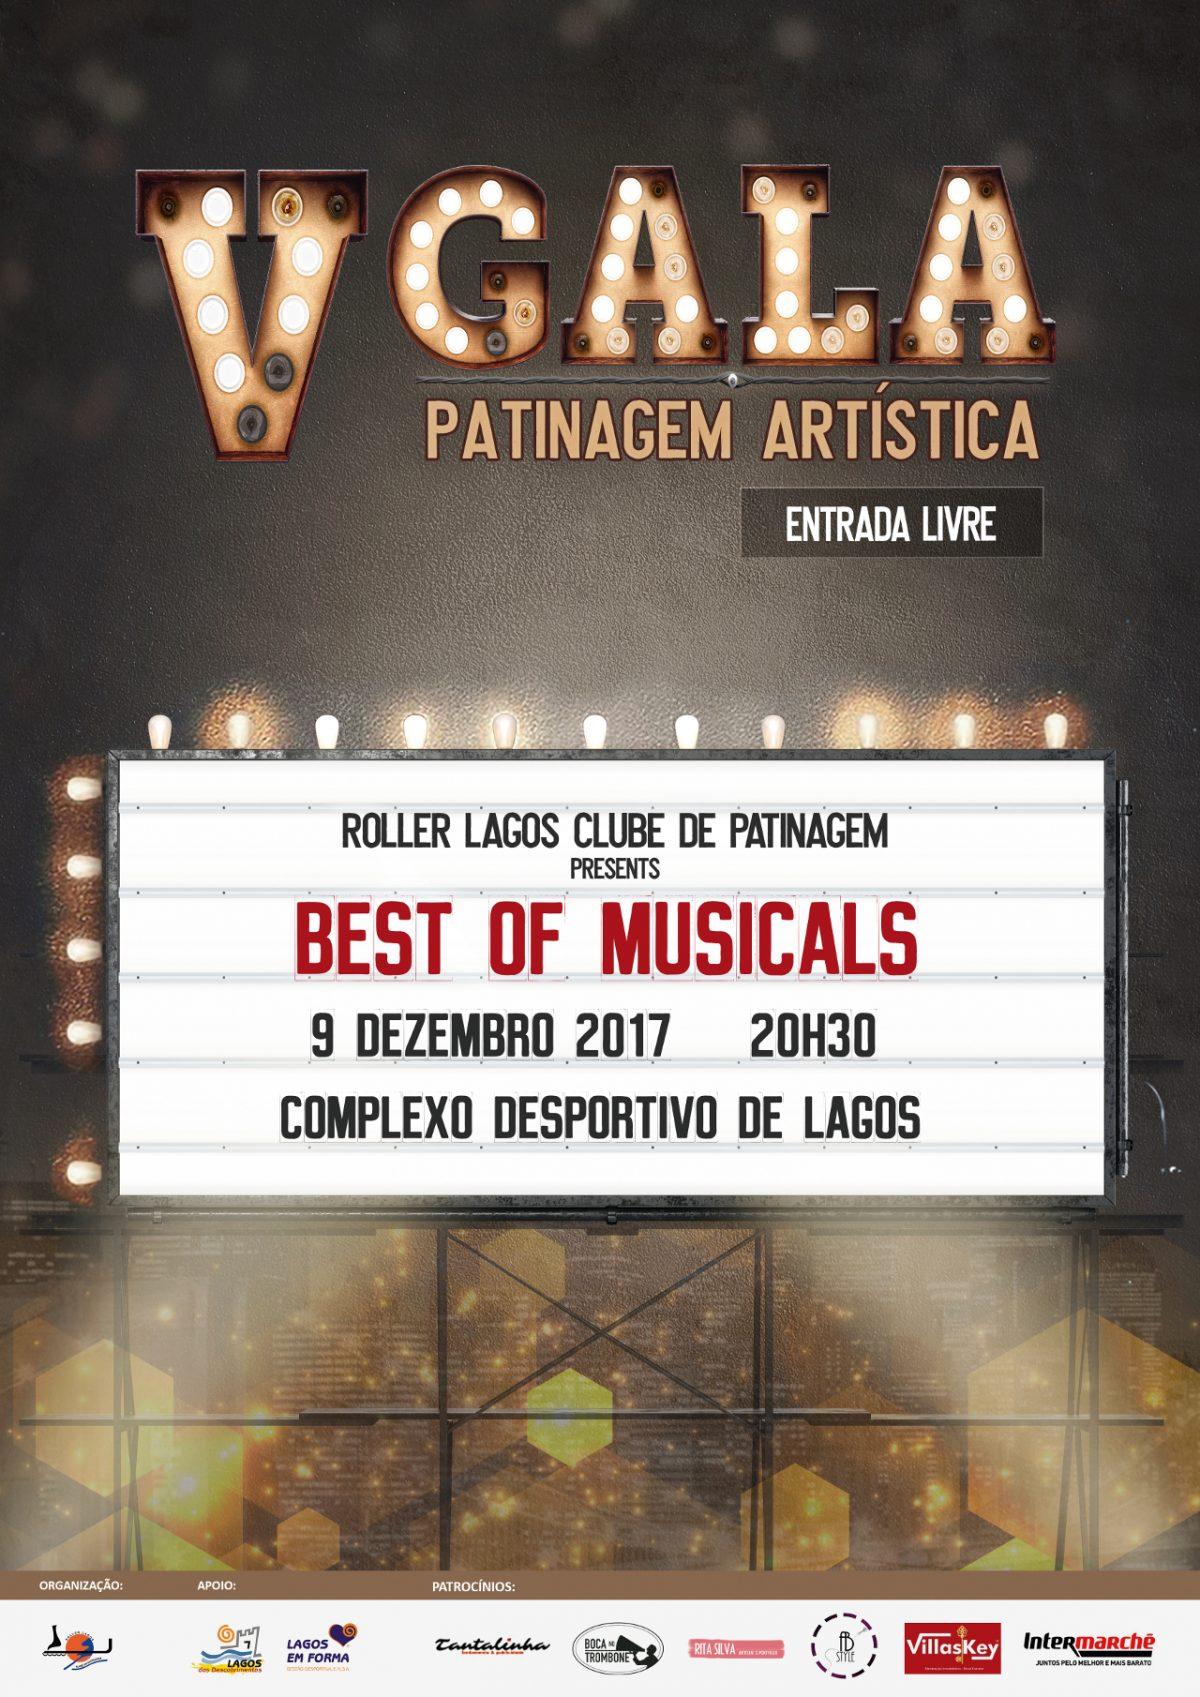 V Gala Patinagem Artistica Cartaz VGala 2017 RLCP 1200x1697